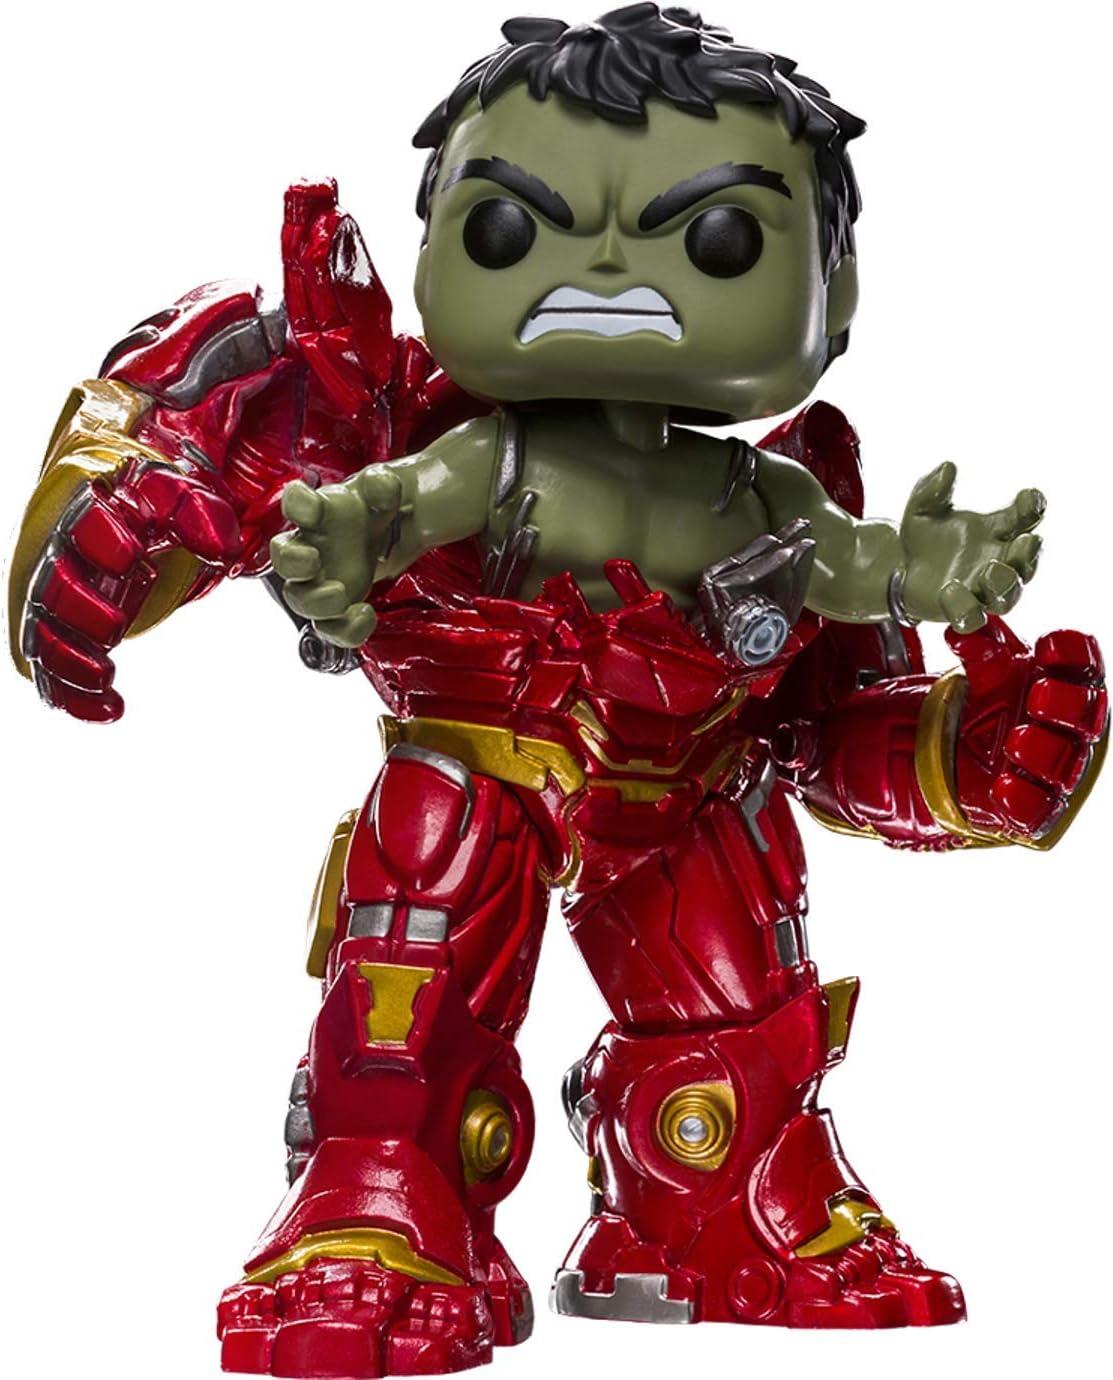 Funko Pop! Marvel Avengers Infinity War Hulk #306 Busting out of Hulkbuster Exclusive: Amazon.es: Juguetes y juegos